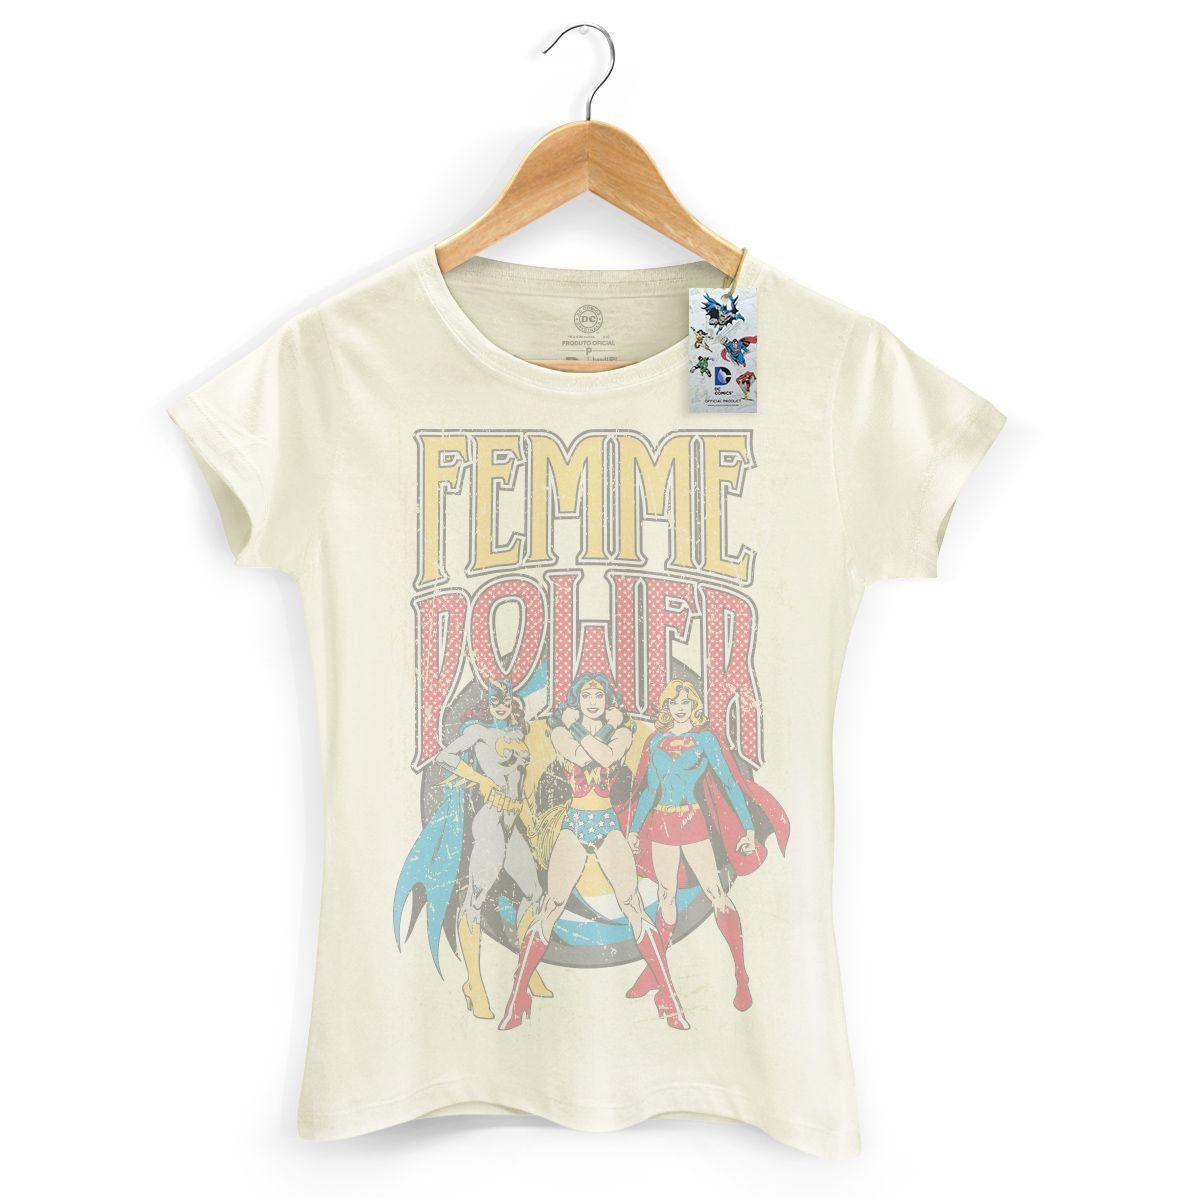 Kit com 3 Camisetas Femininas Supercool  - bandUP Store Marketplace